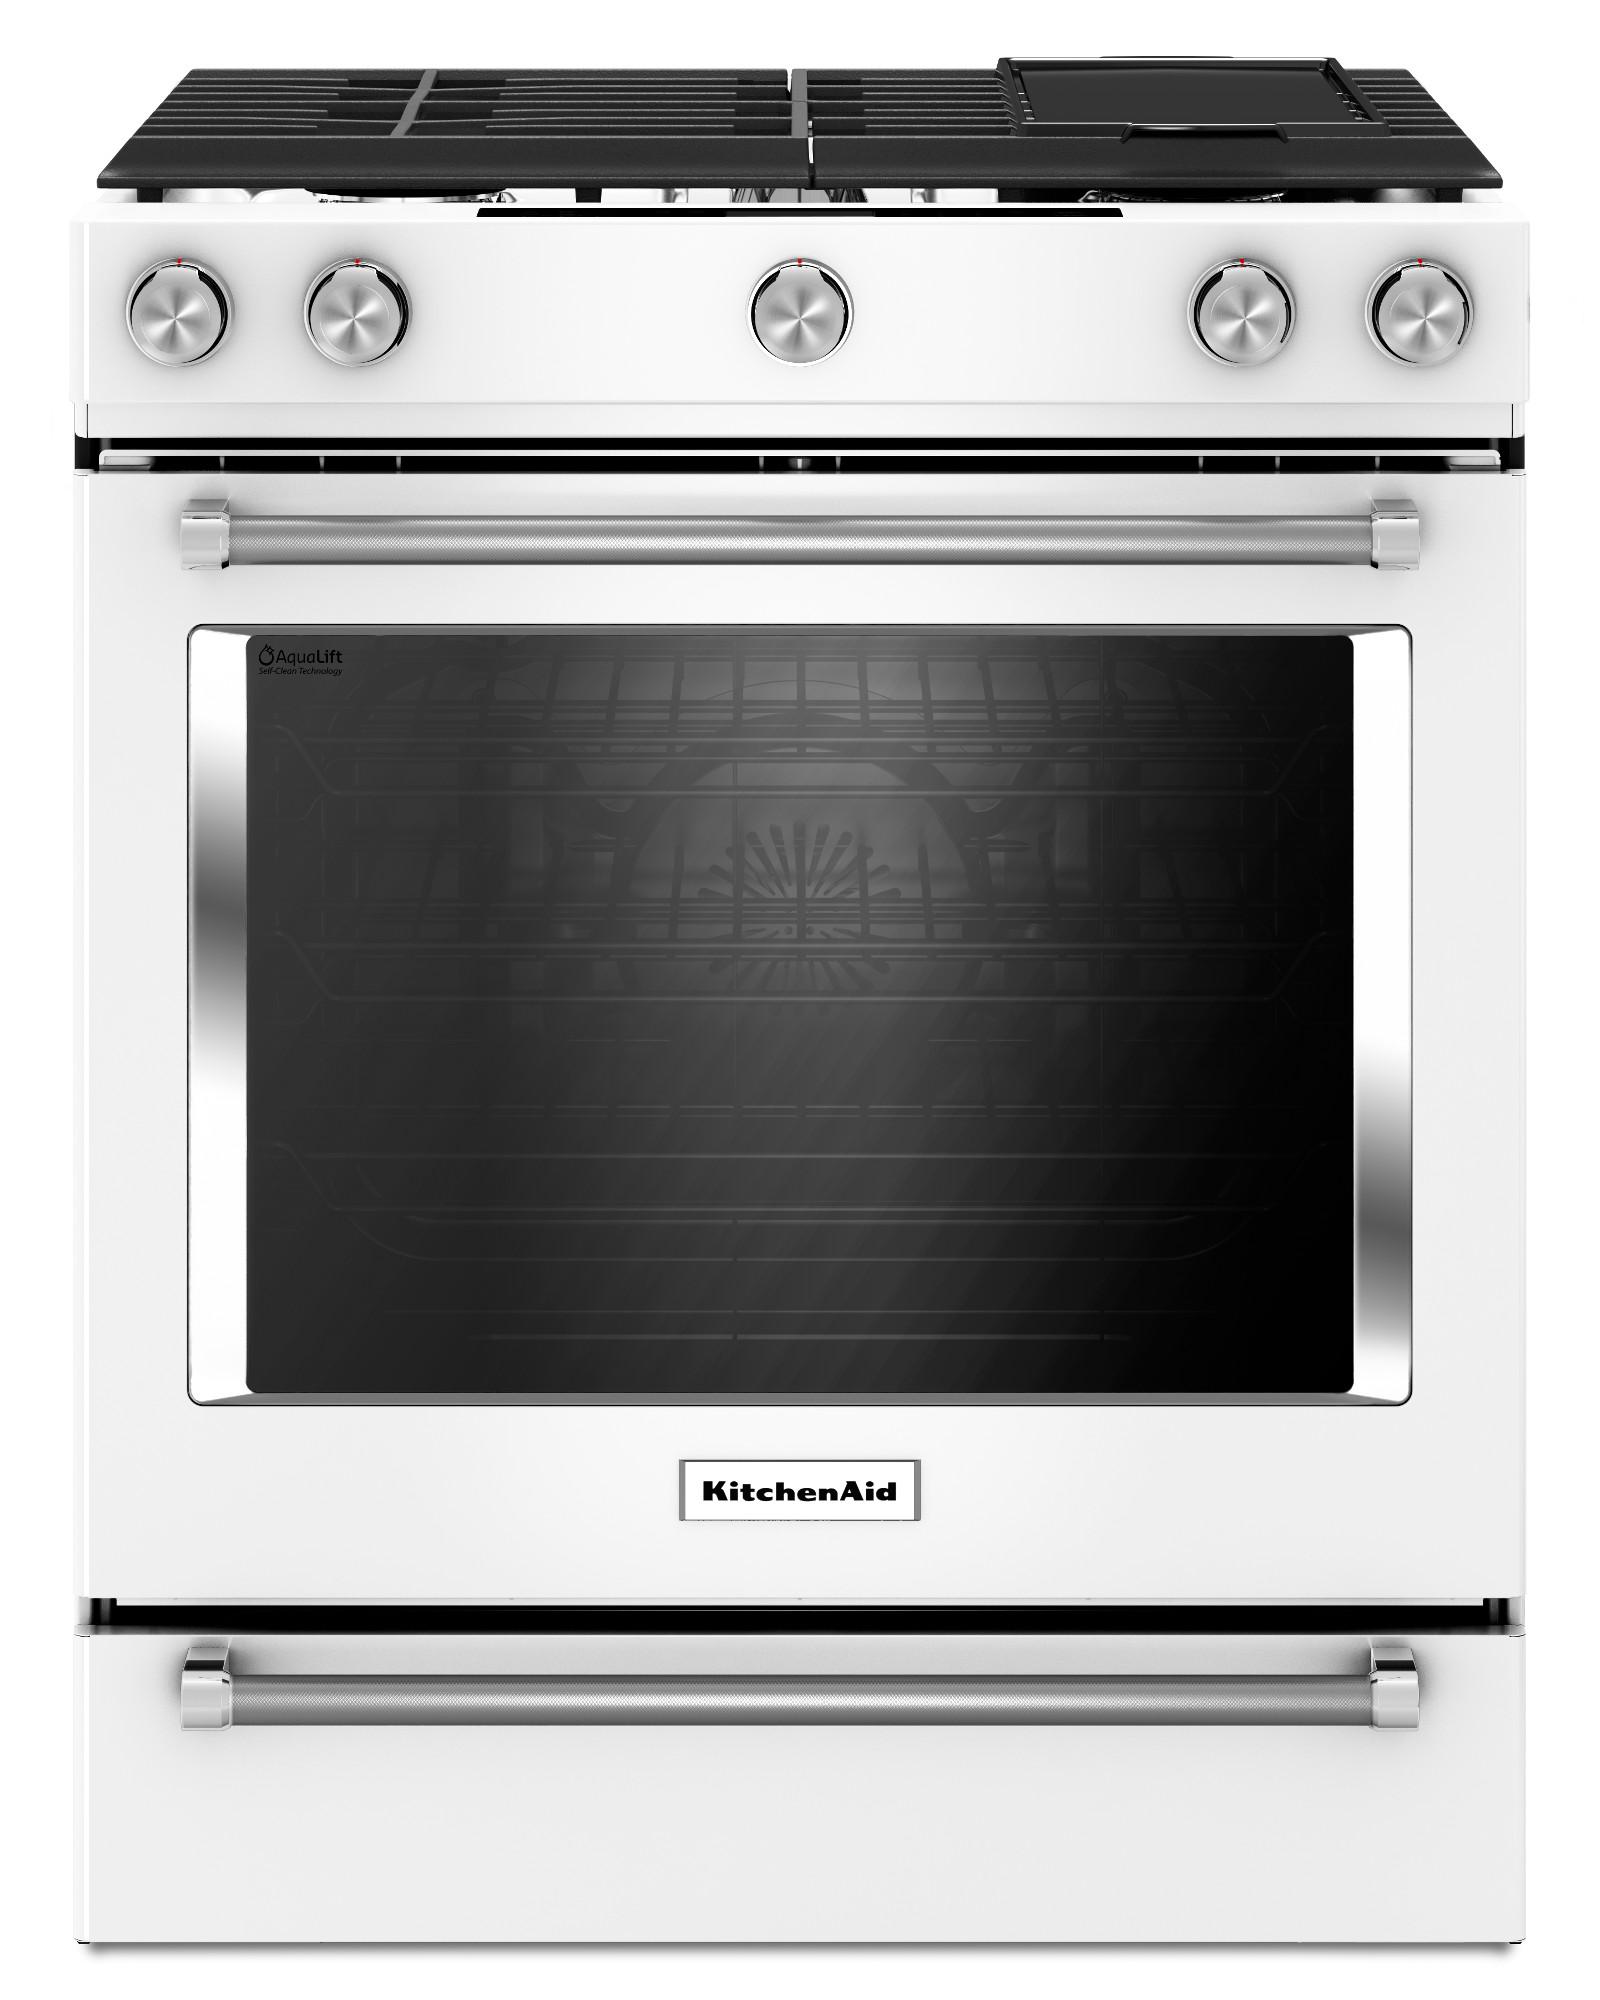 Kitchenaid Conventional Oven